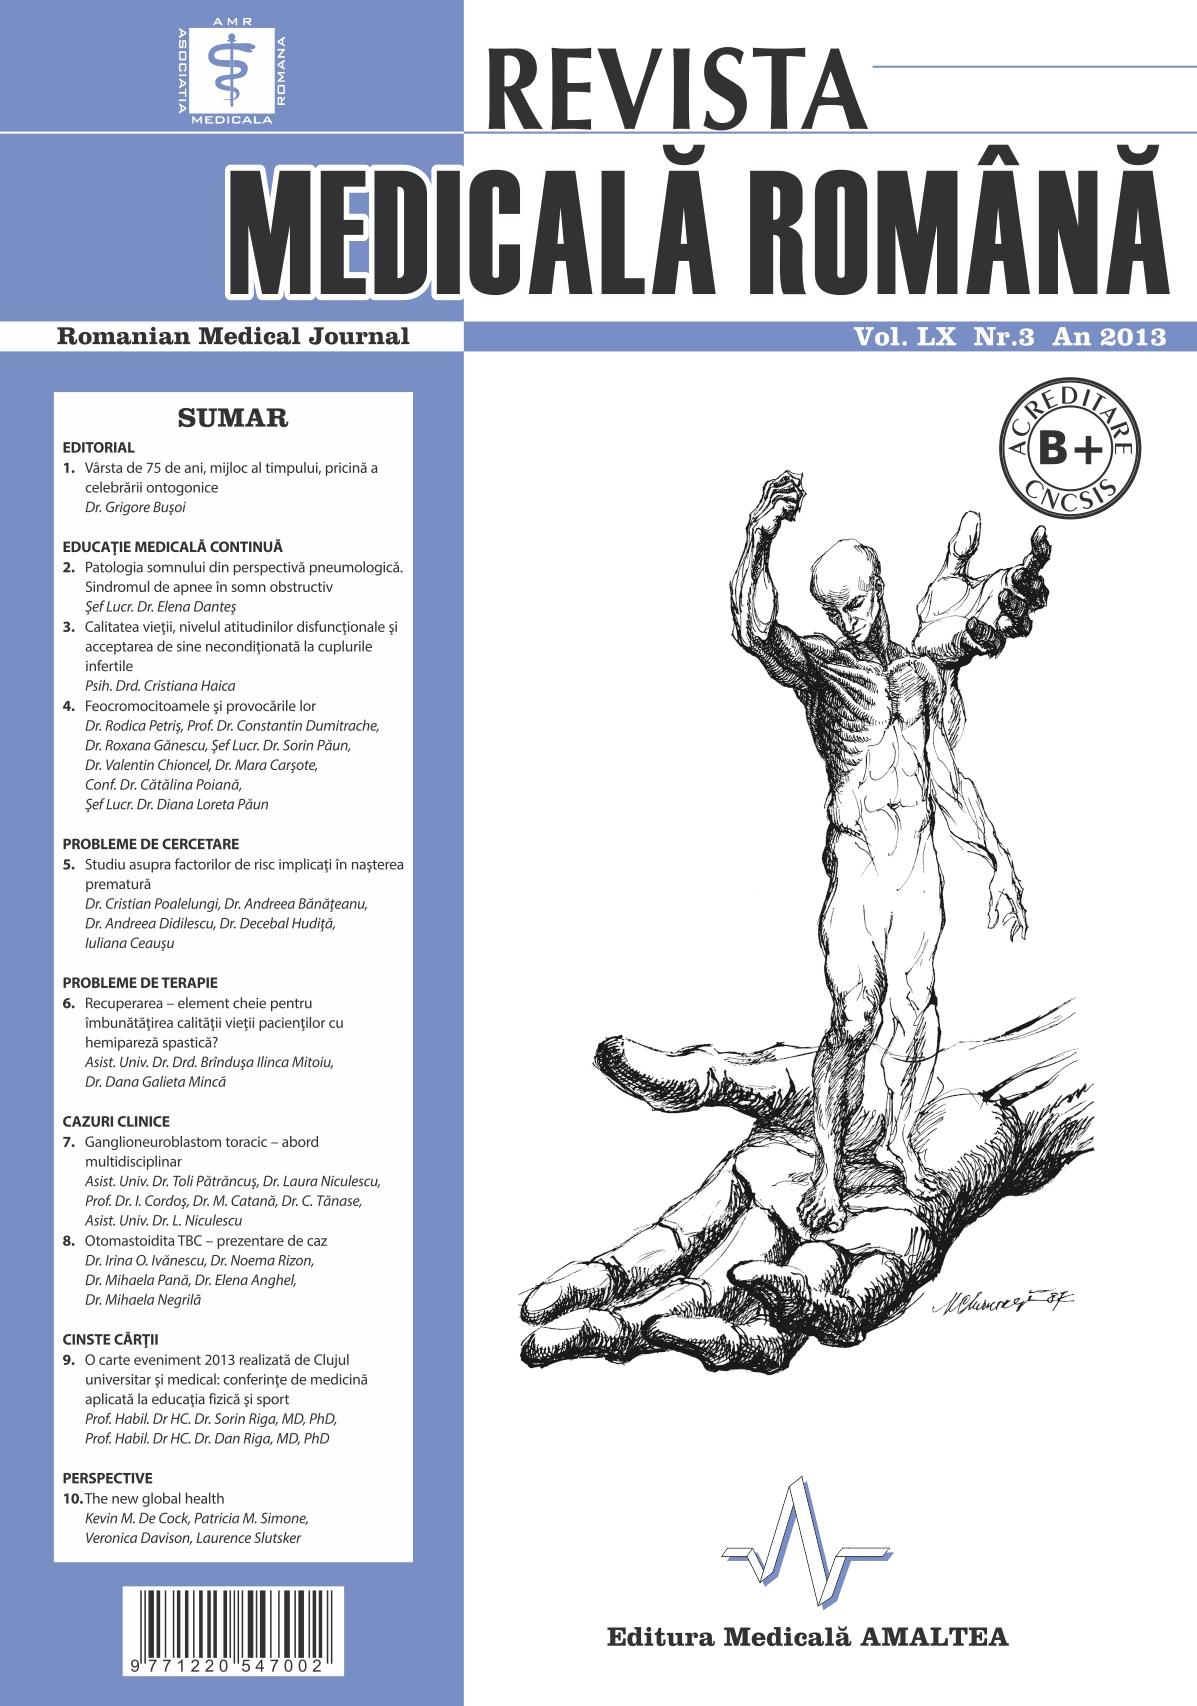 REVISTA MEDICALA ROMANA - Romanian Medical Journal, Vol. LX, Nr. 3, An 2013